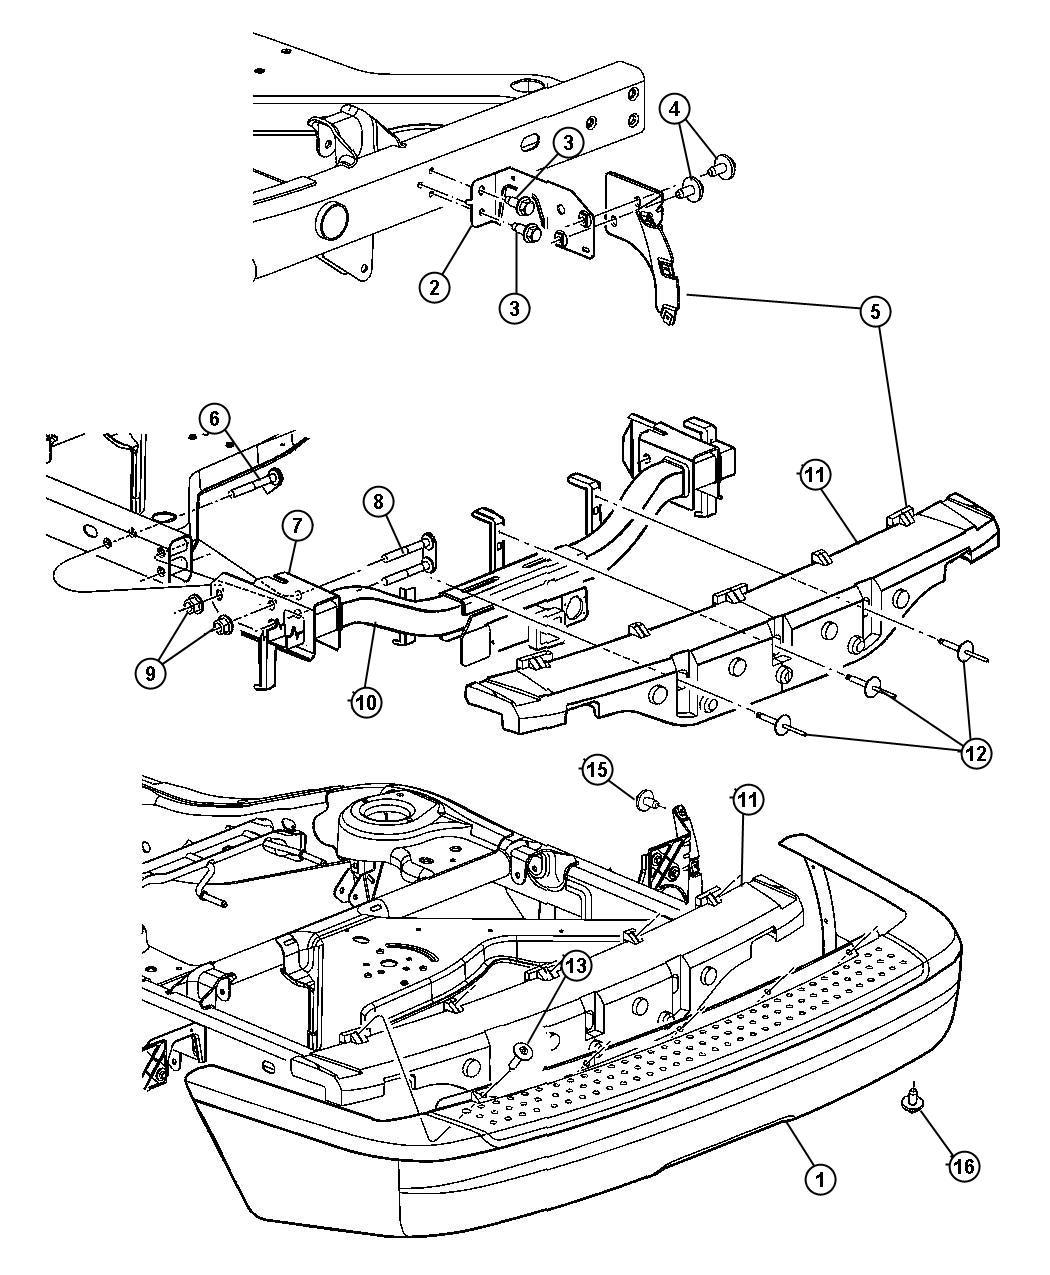 2004 dodge durango engine diagram wiring rocker switch grand caravan 1996